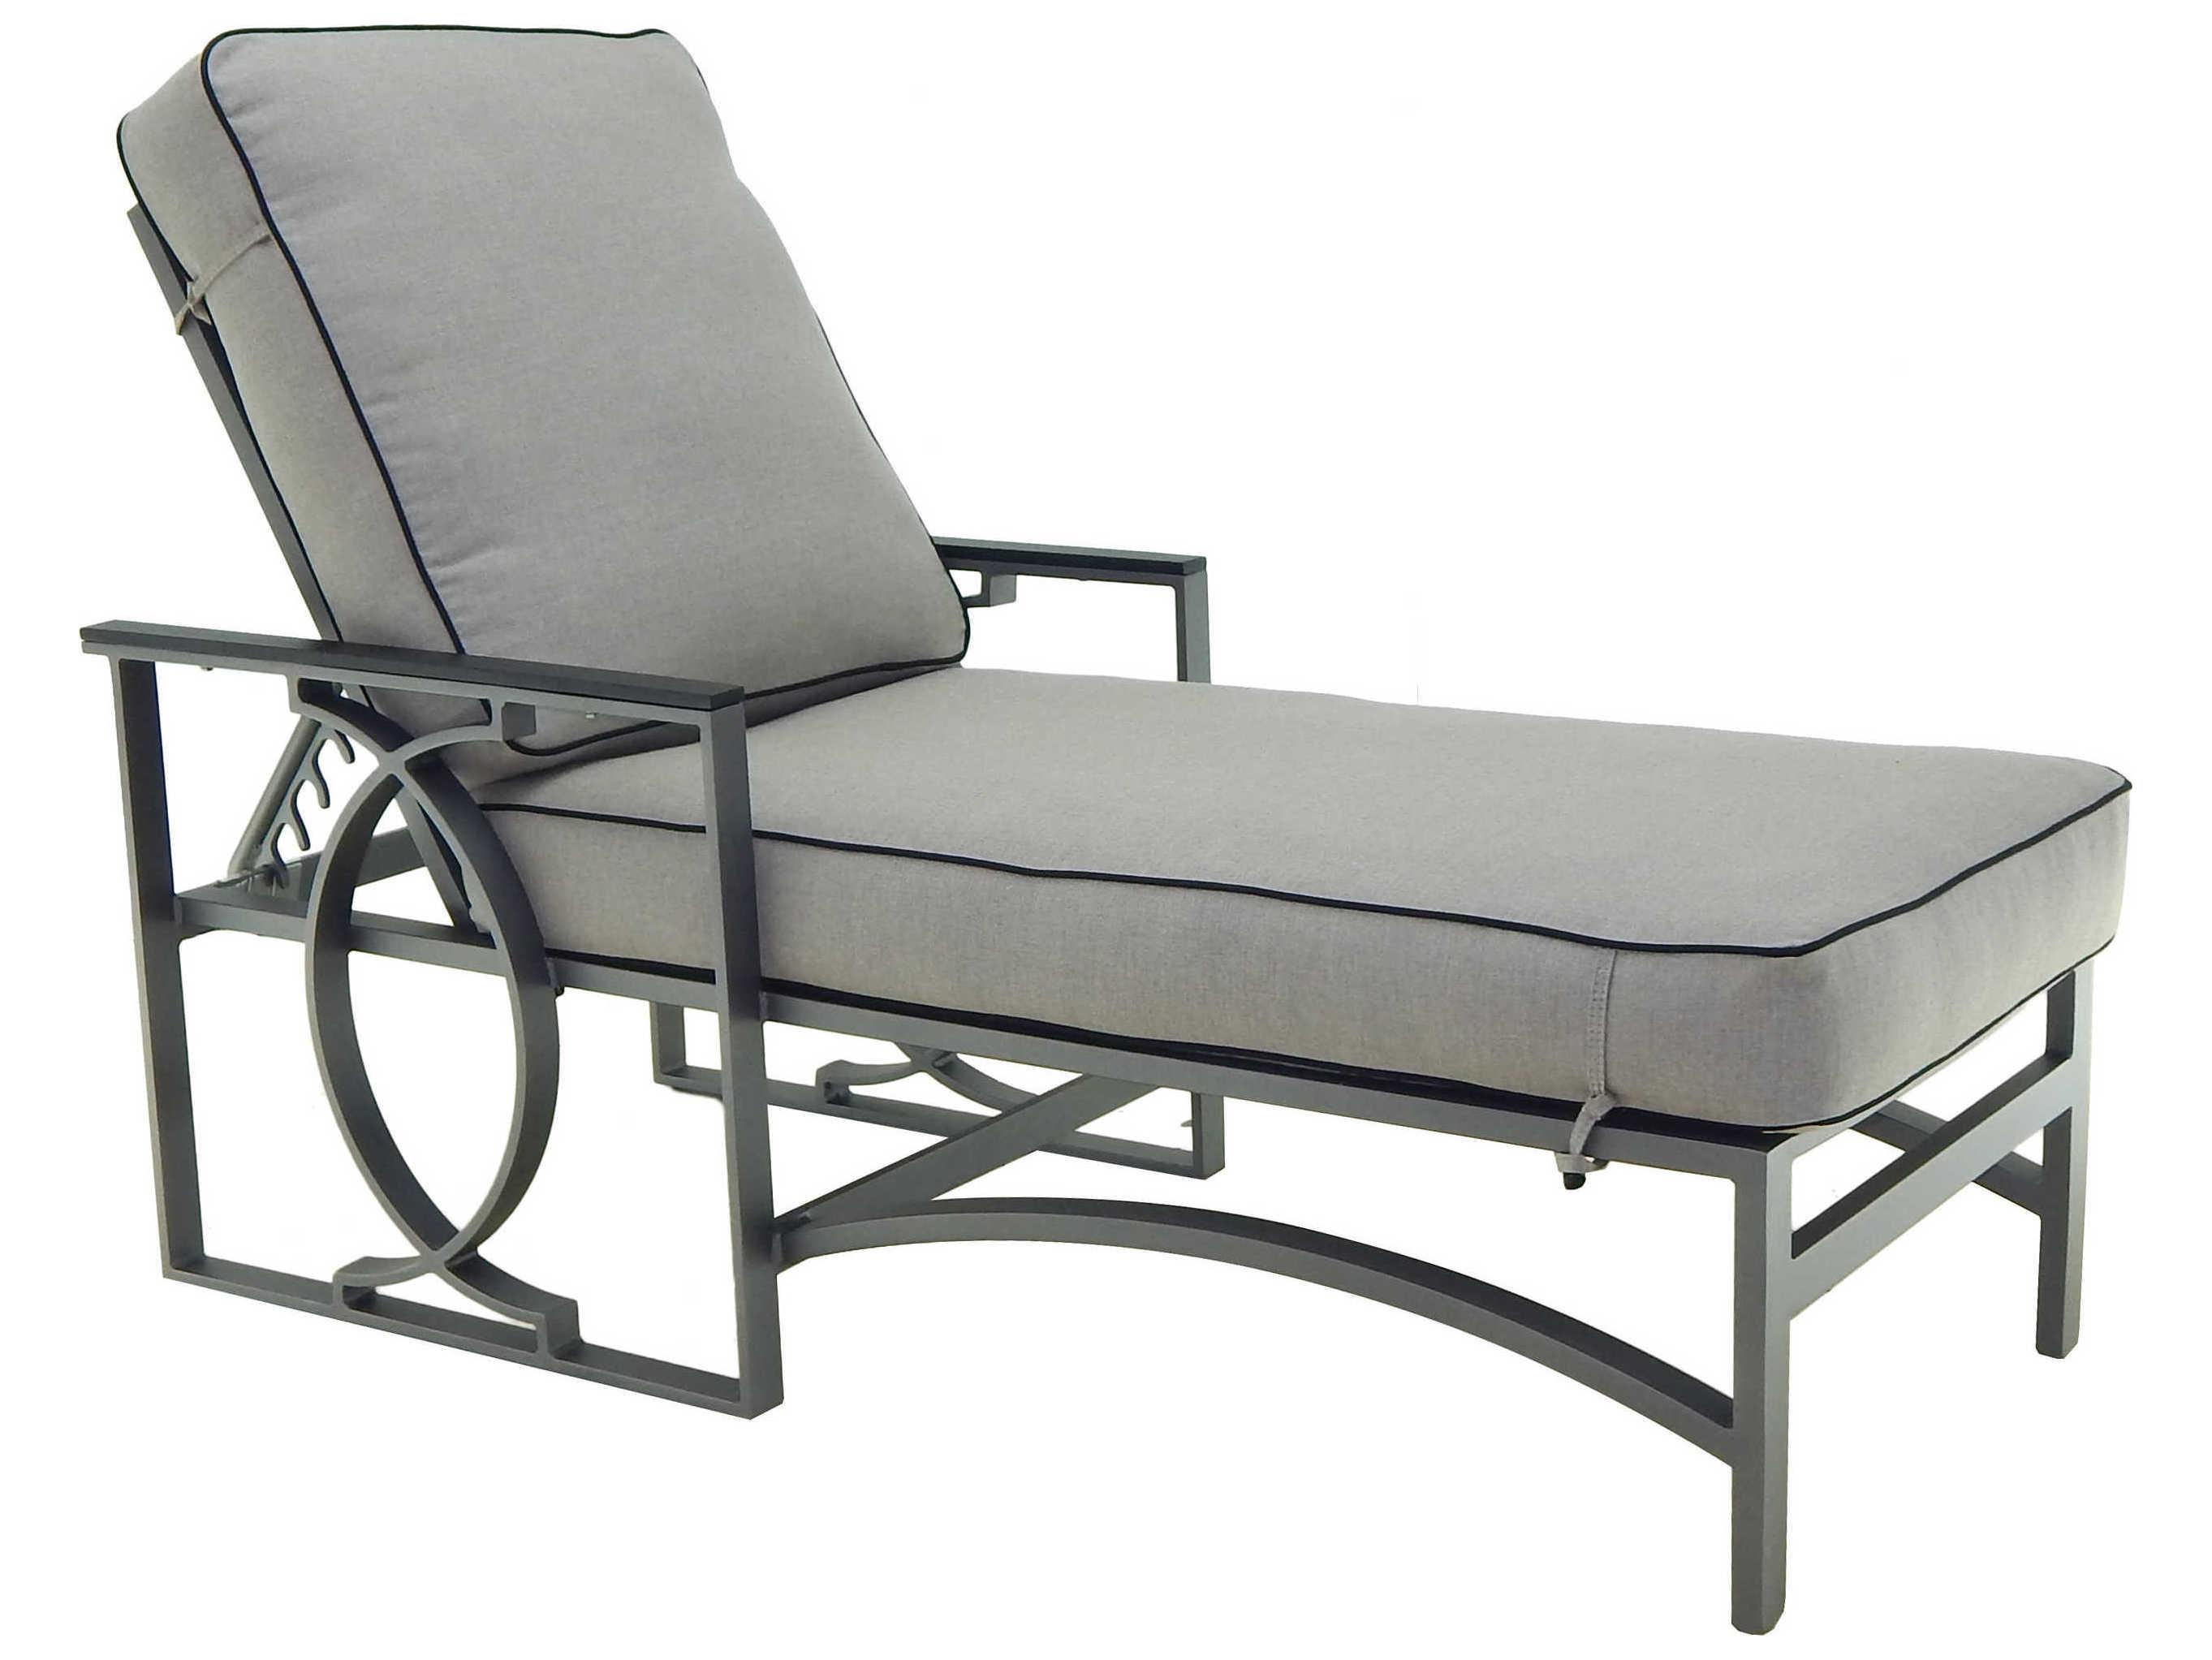 Castelle sunrise cushion cast aluminum adjustable chaise for Cast aluminum chaise lounge with wheels